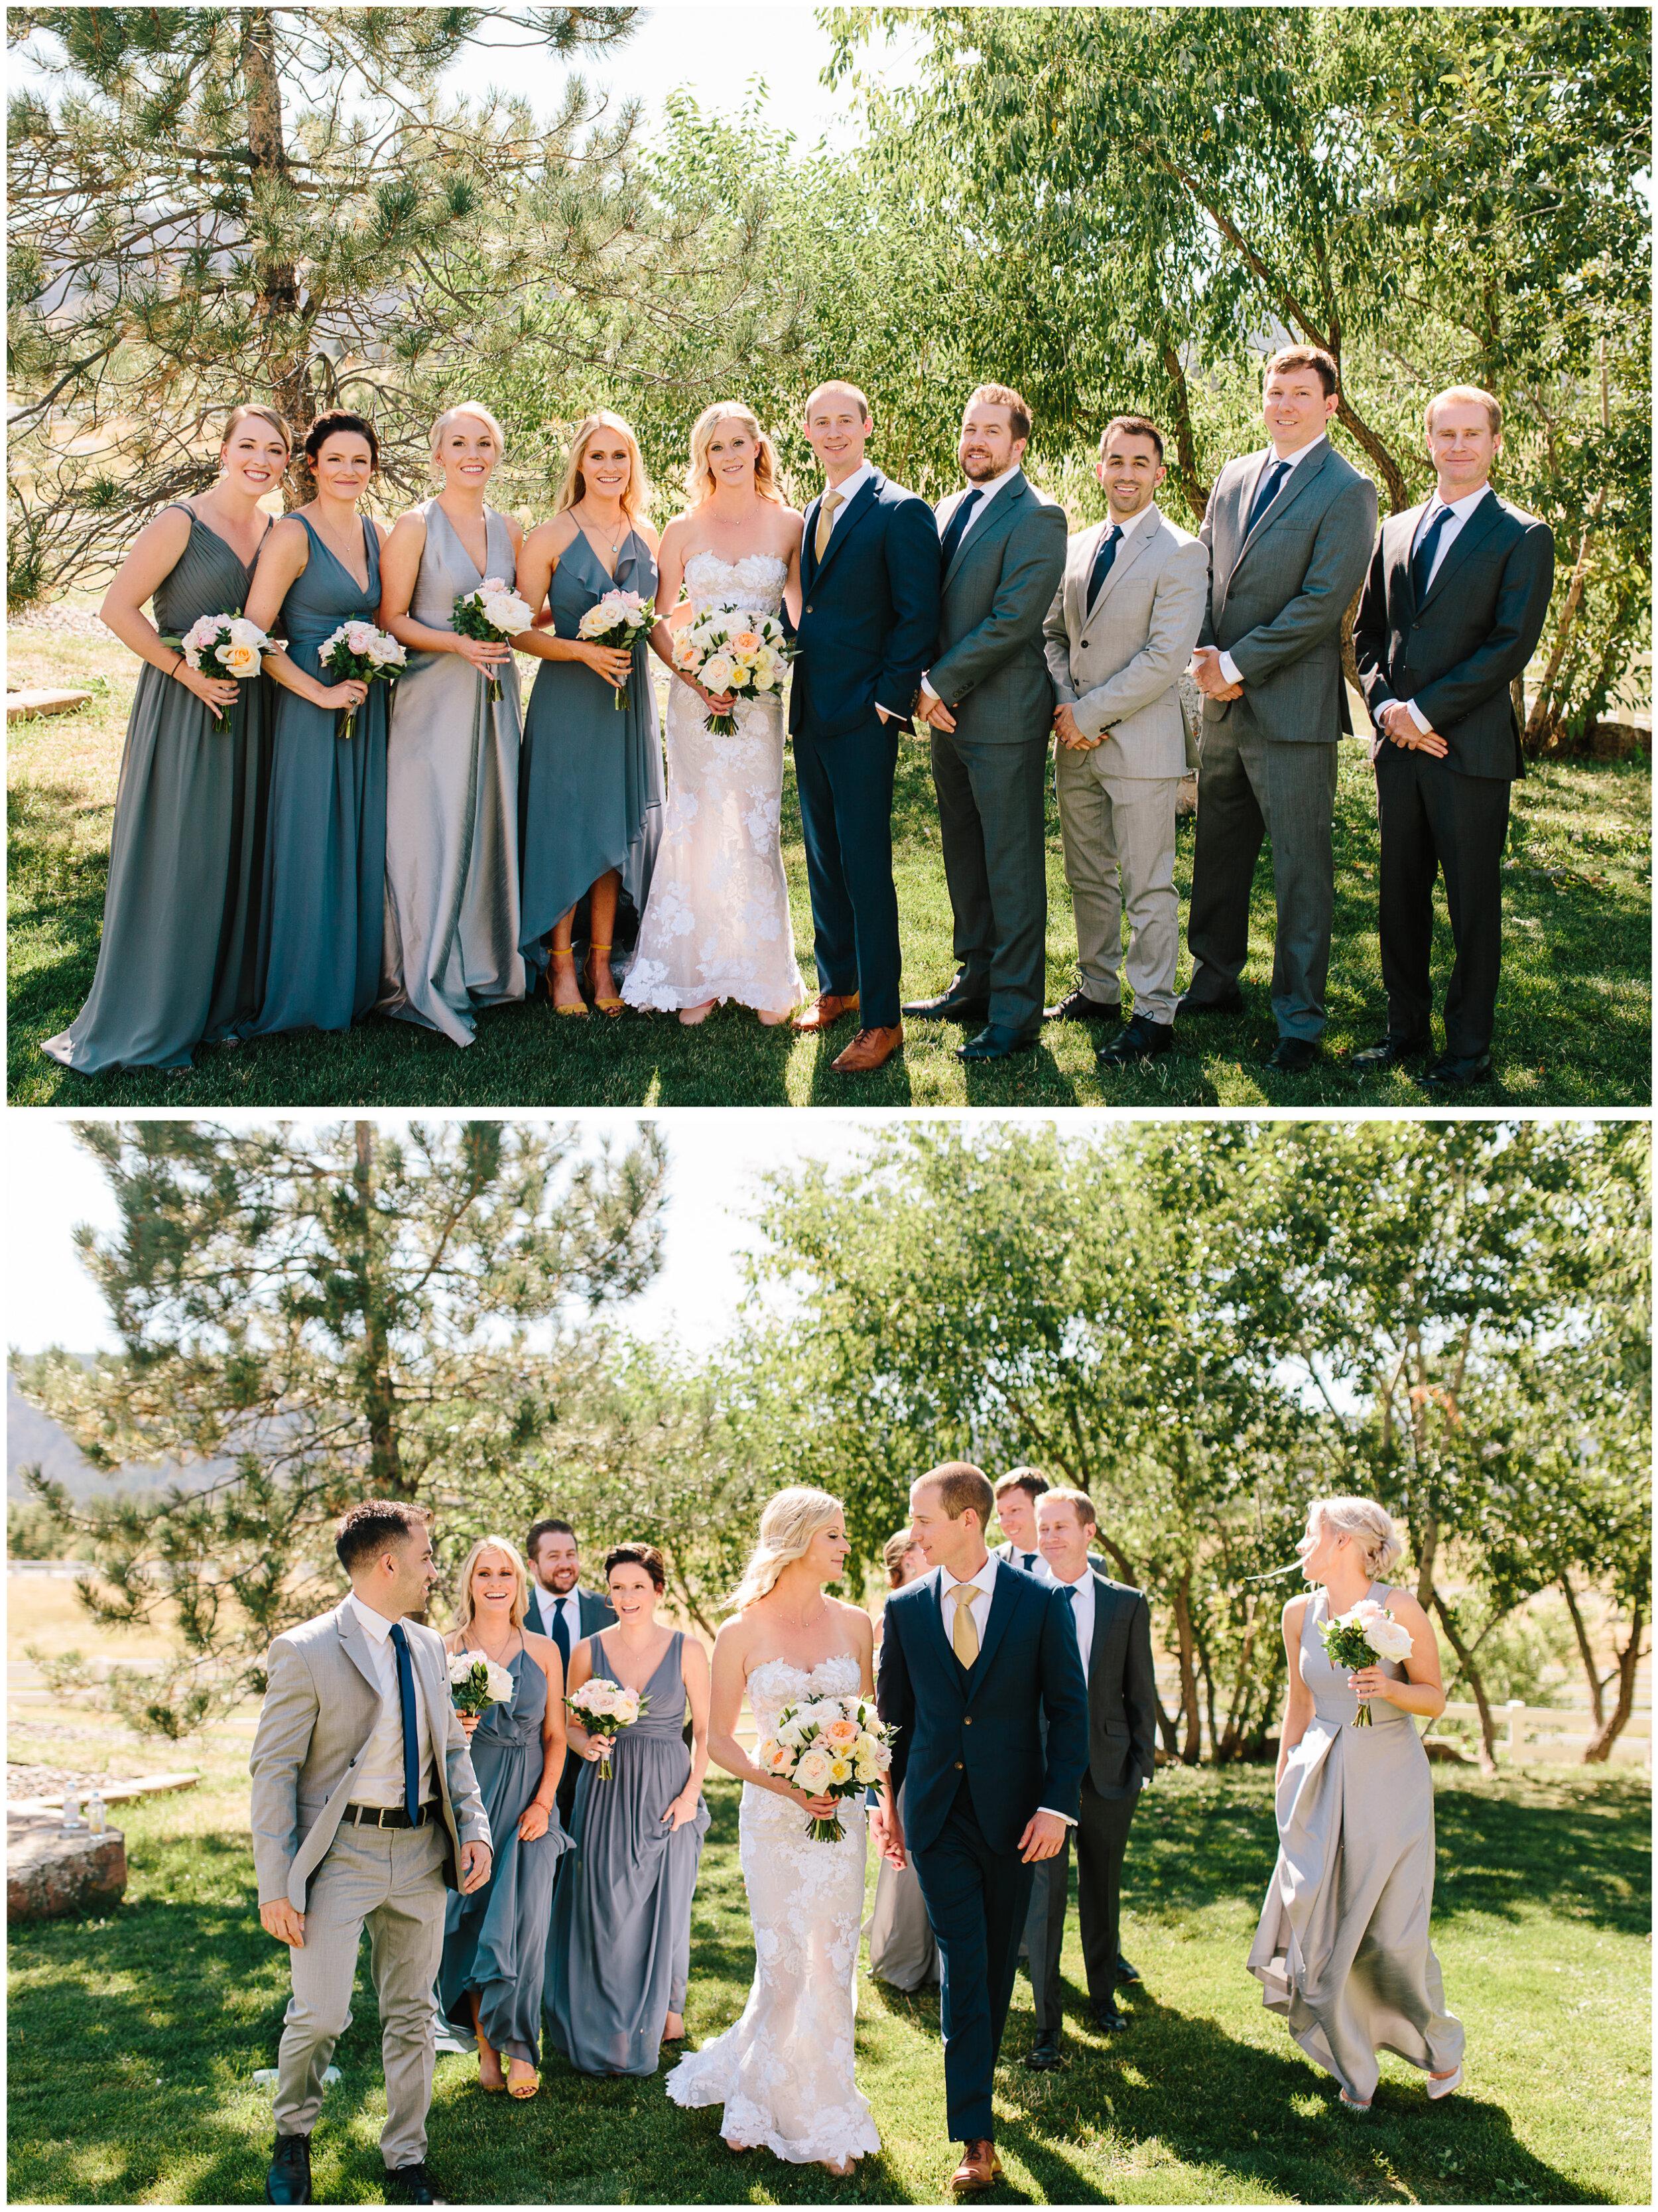 larkspur_colorado_wedding_28.jpg